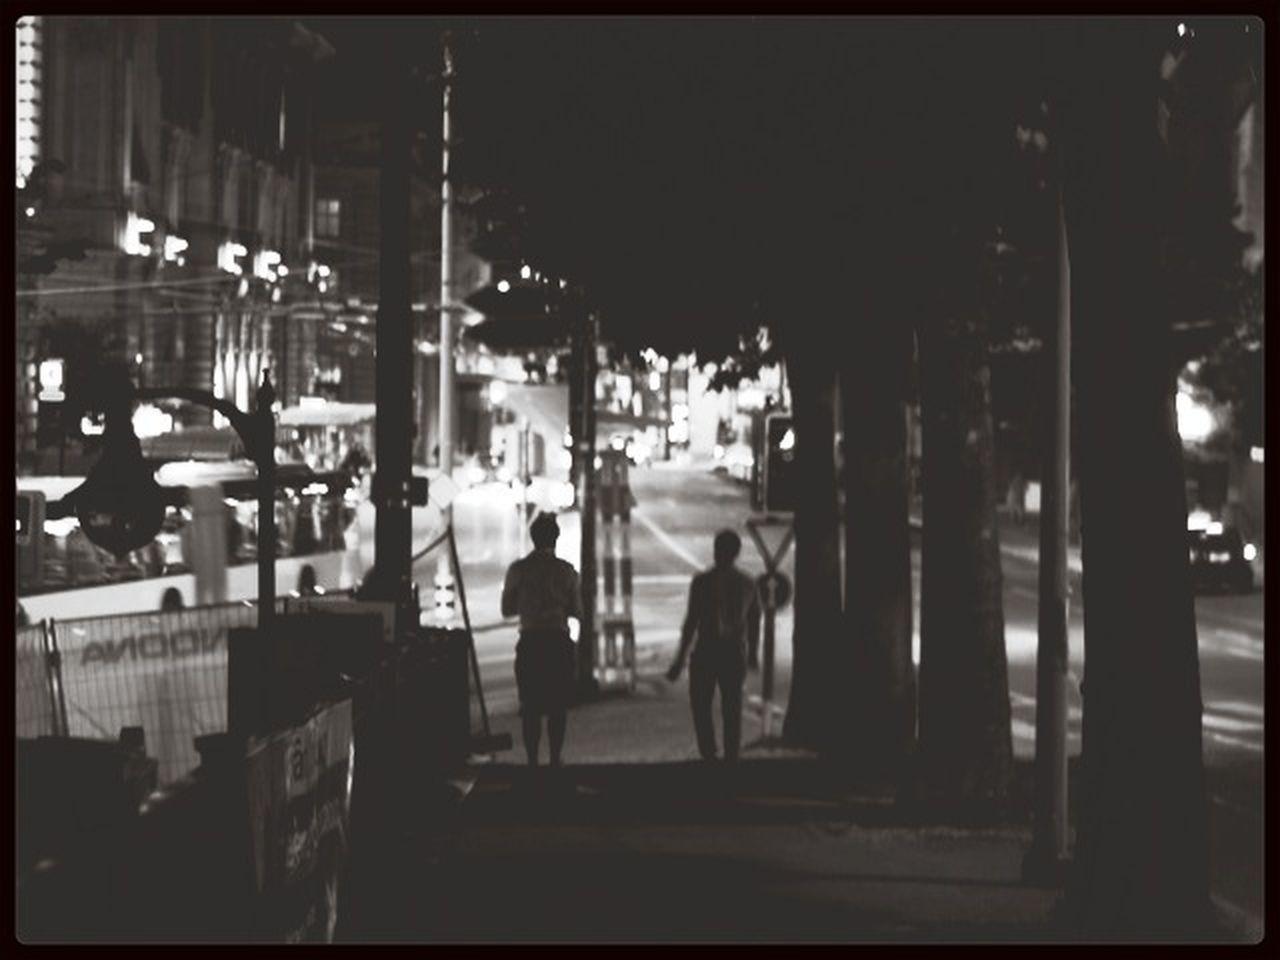 night, illuminated, street, city, real people, building exterior, men, outdoors, women, people